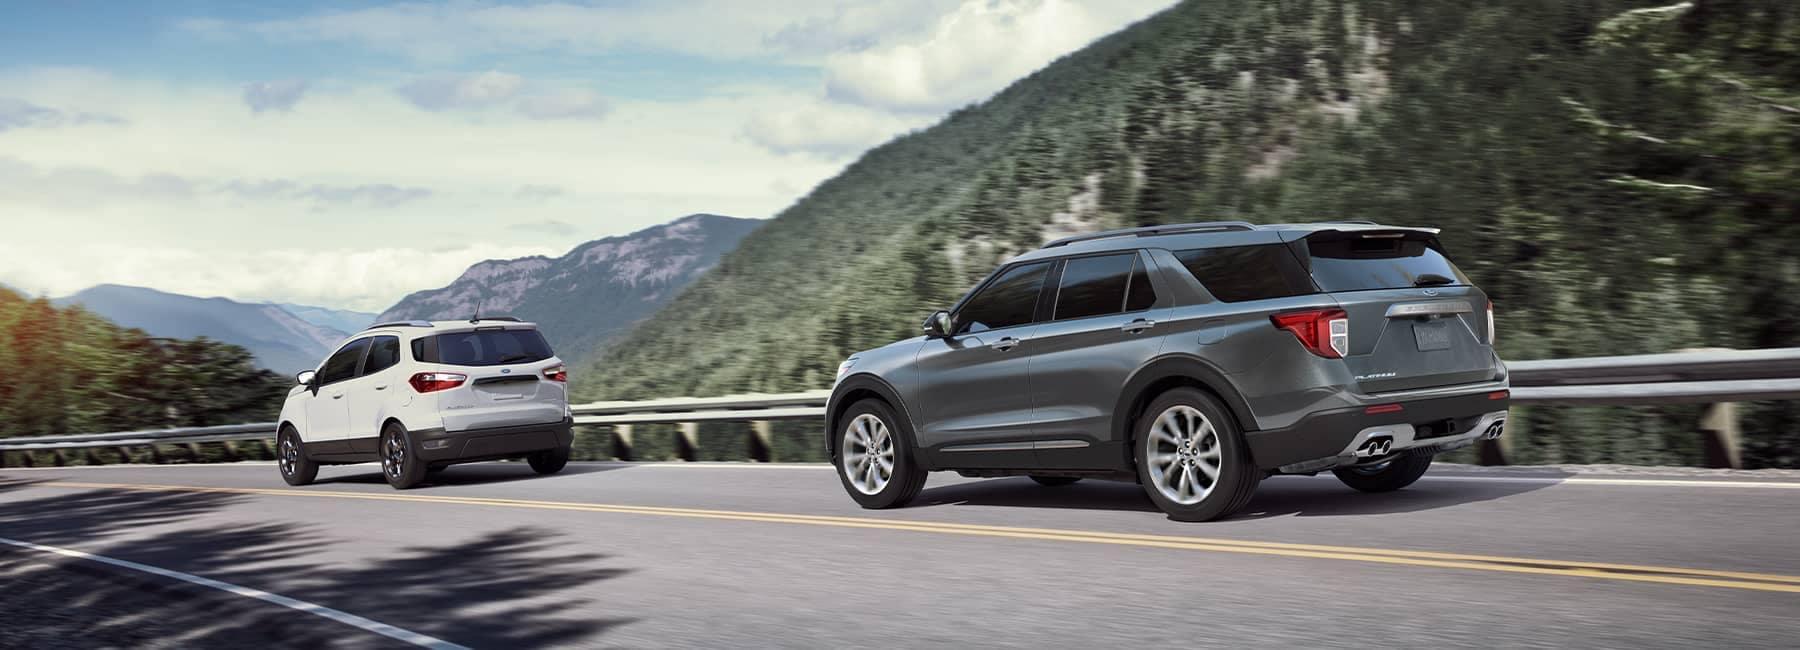 Grey 2021 Ford Explorer driving through a mountain pass